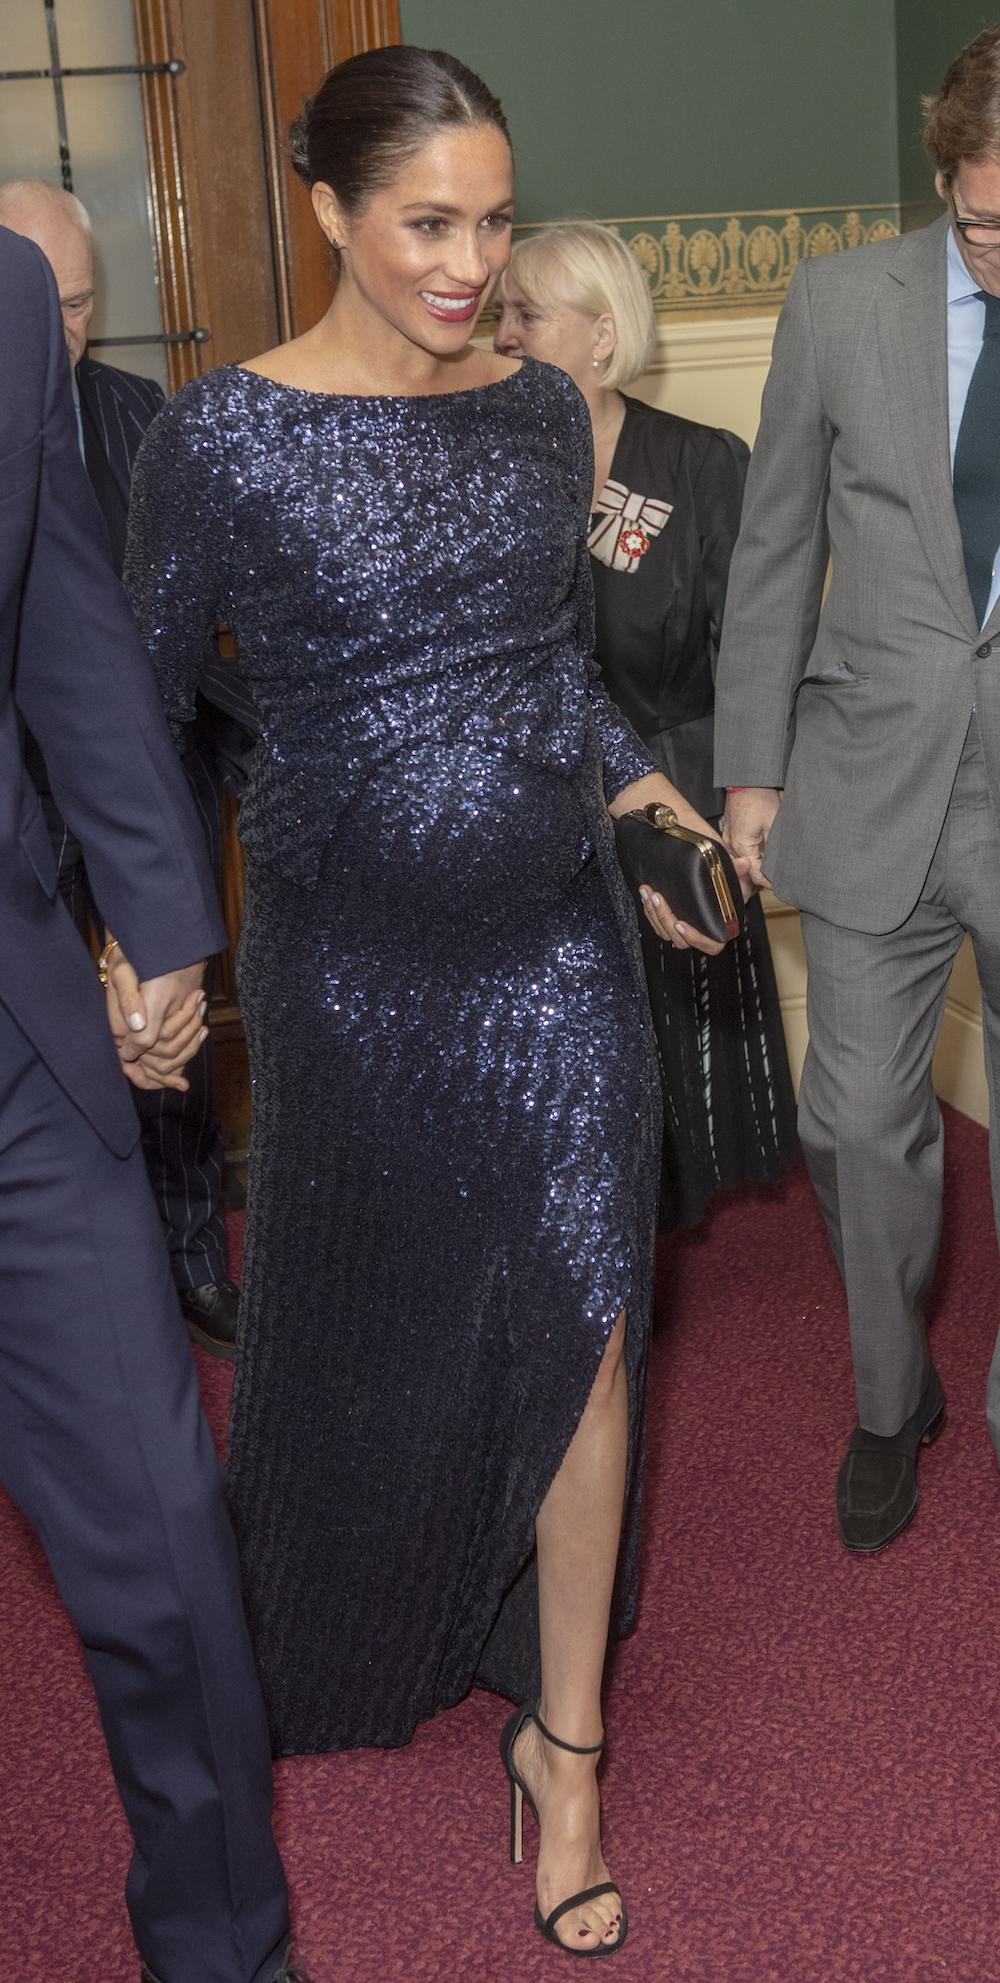 Meghan at the Royal Albert Hall in January